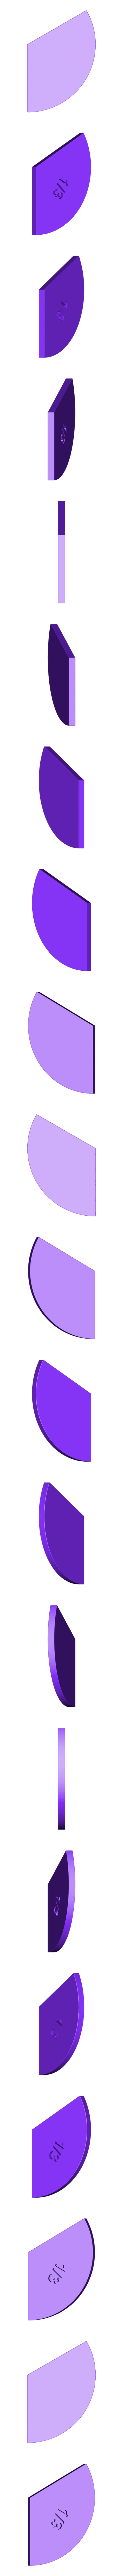 UnitFraction-1over3.stl Download free STL file Unit Fractions, Math Models • Object to 3D print, LGBU